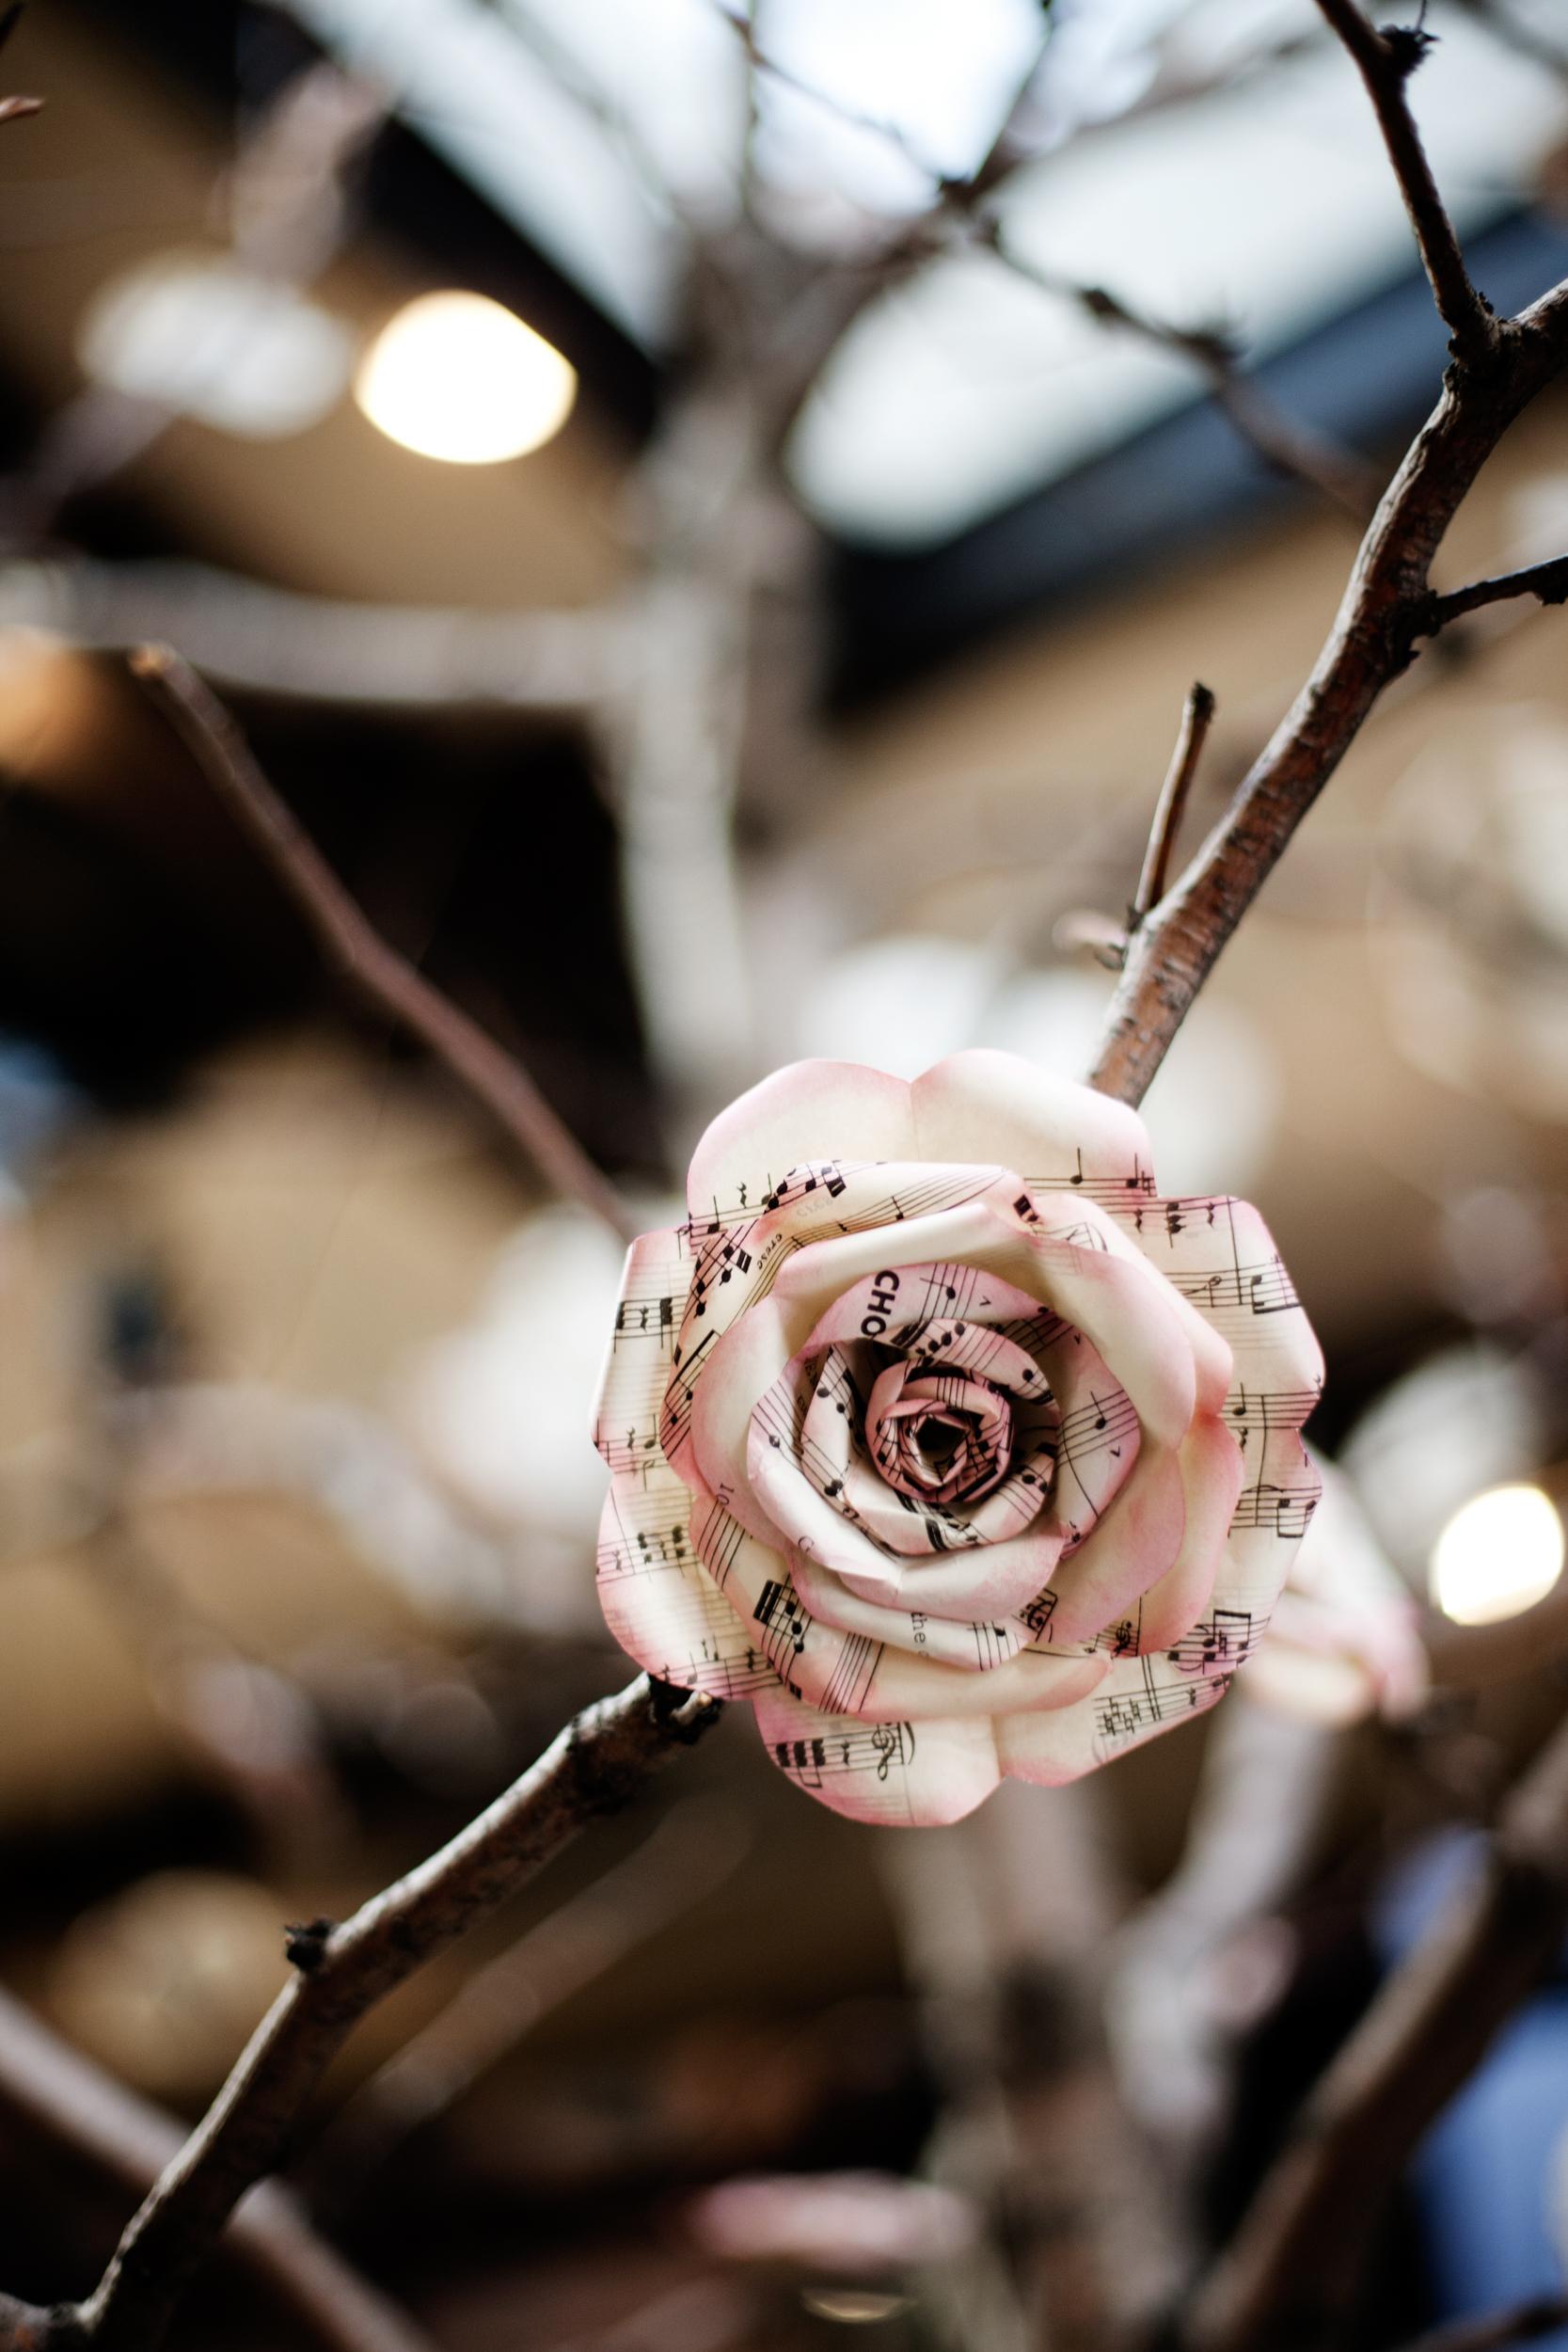 Ceci_New_York_Ceci_Style_Ceci_Johnson_Luxury_Lifestyle_Floral_Lace_Wedding_Letterpress_Inspiration_Design_Custom_Couture_Personalized_Invitations_-60.jpg